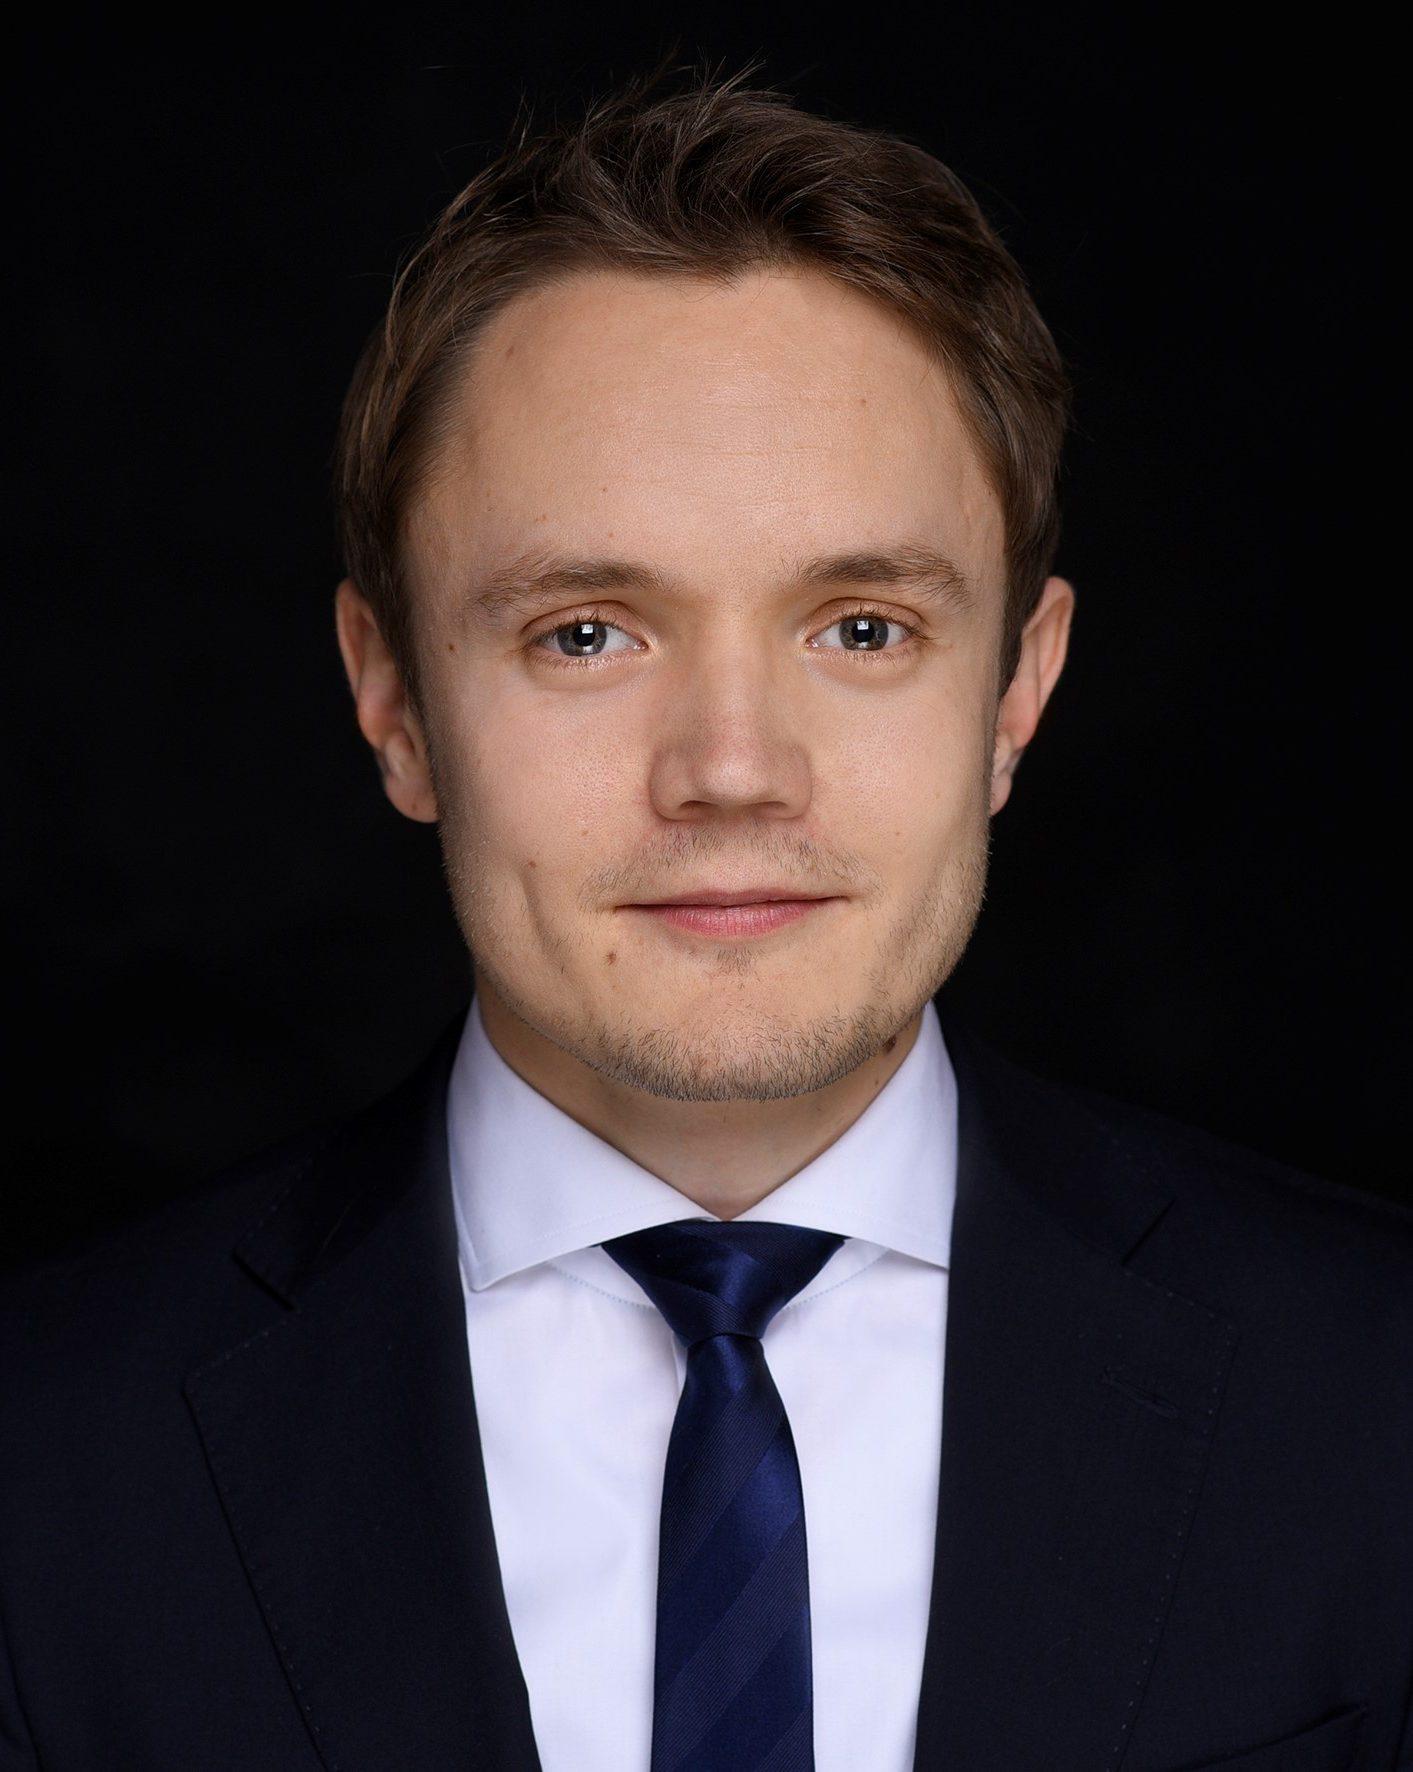 蒂姆·布伦克 (Timo Blenk)